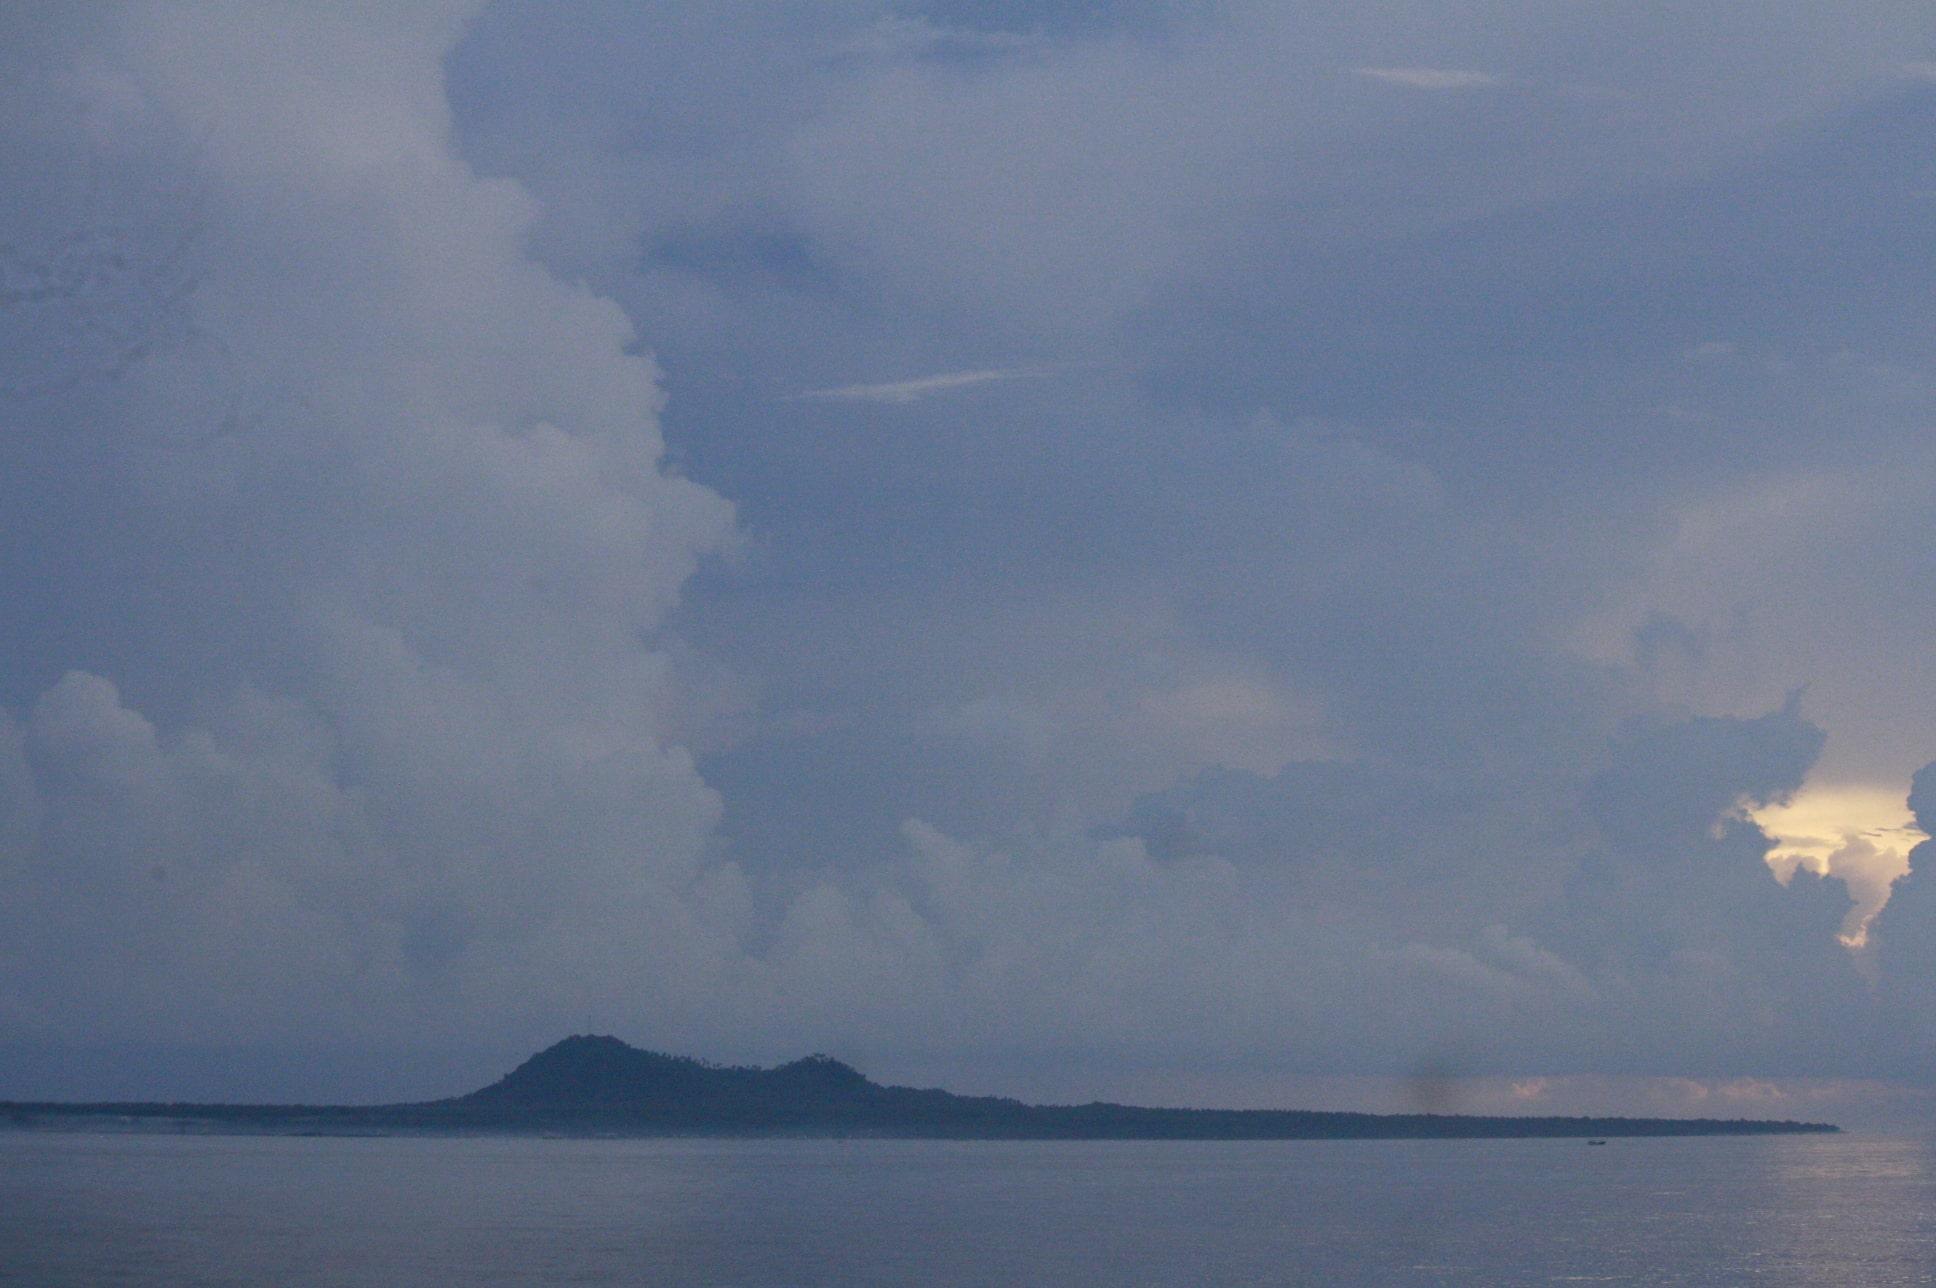 Pemandangan laut di Masalembu | Foto: Fariz Ilham Rosyidi